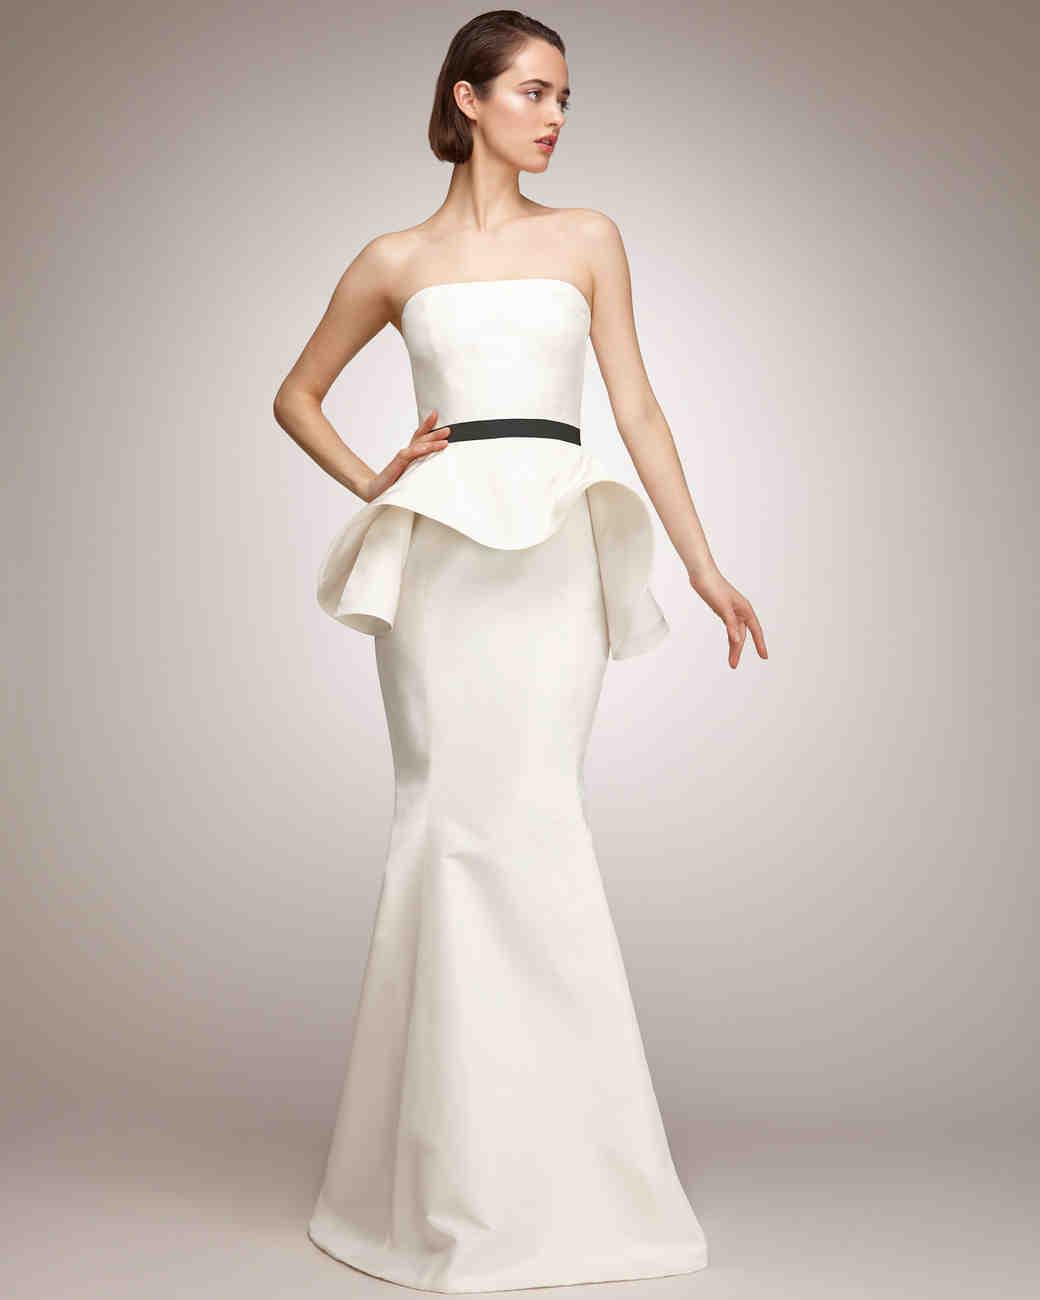 issac-mizrahi-gowns-0611wd2.jpg